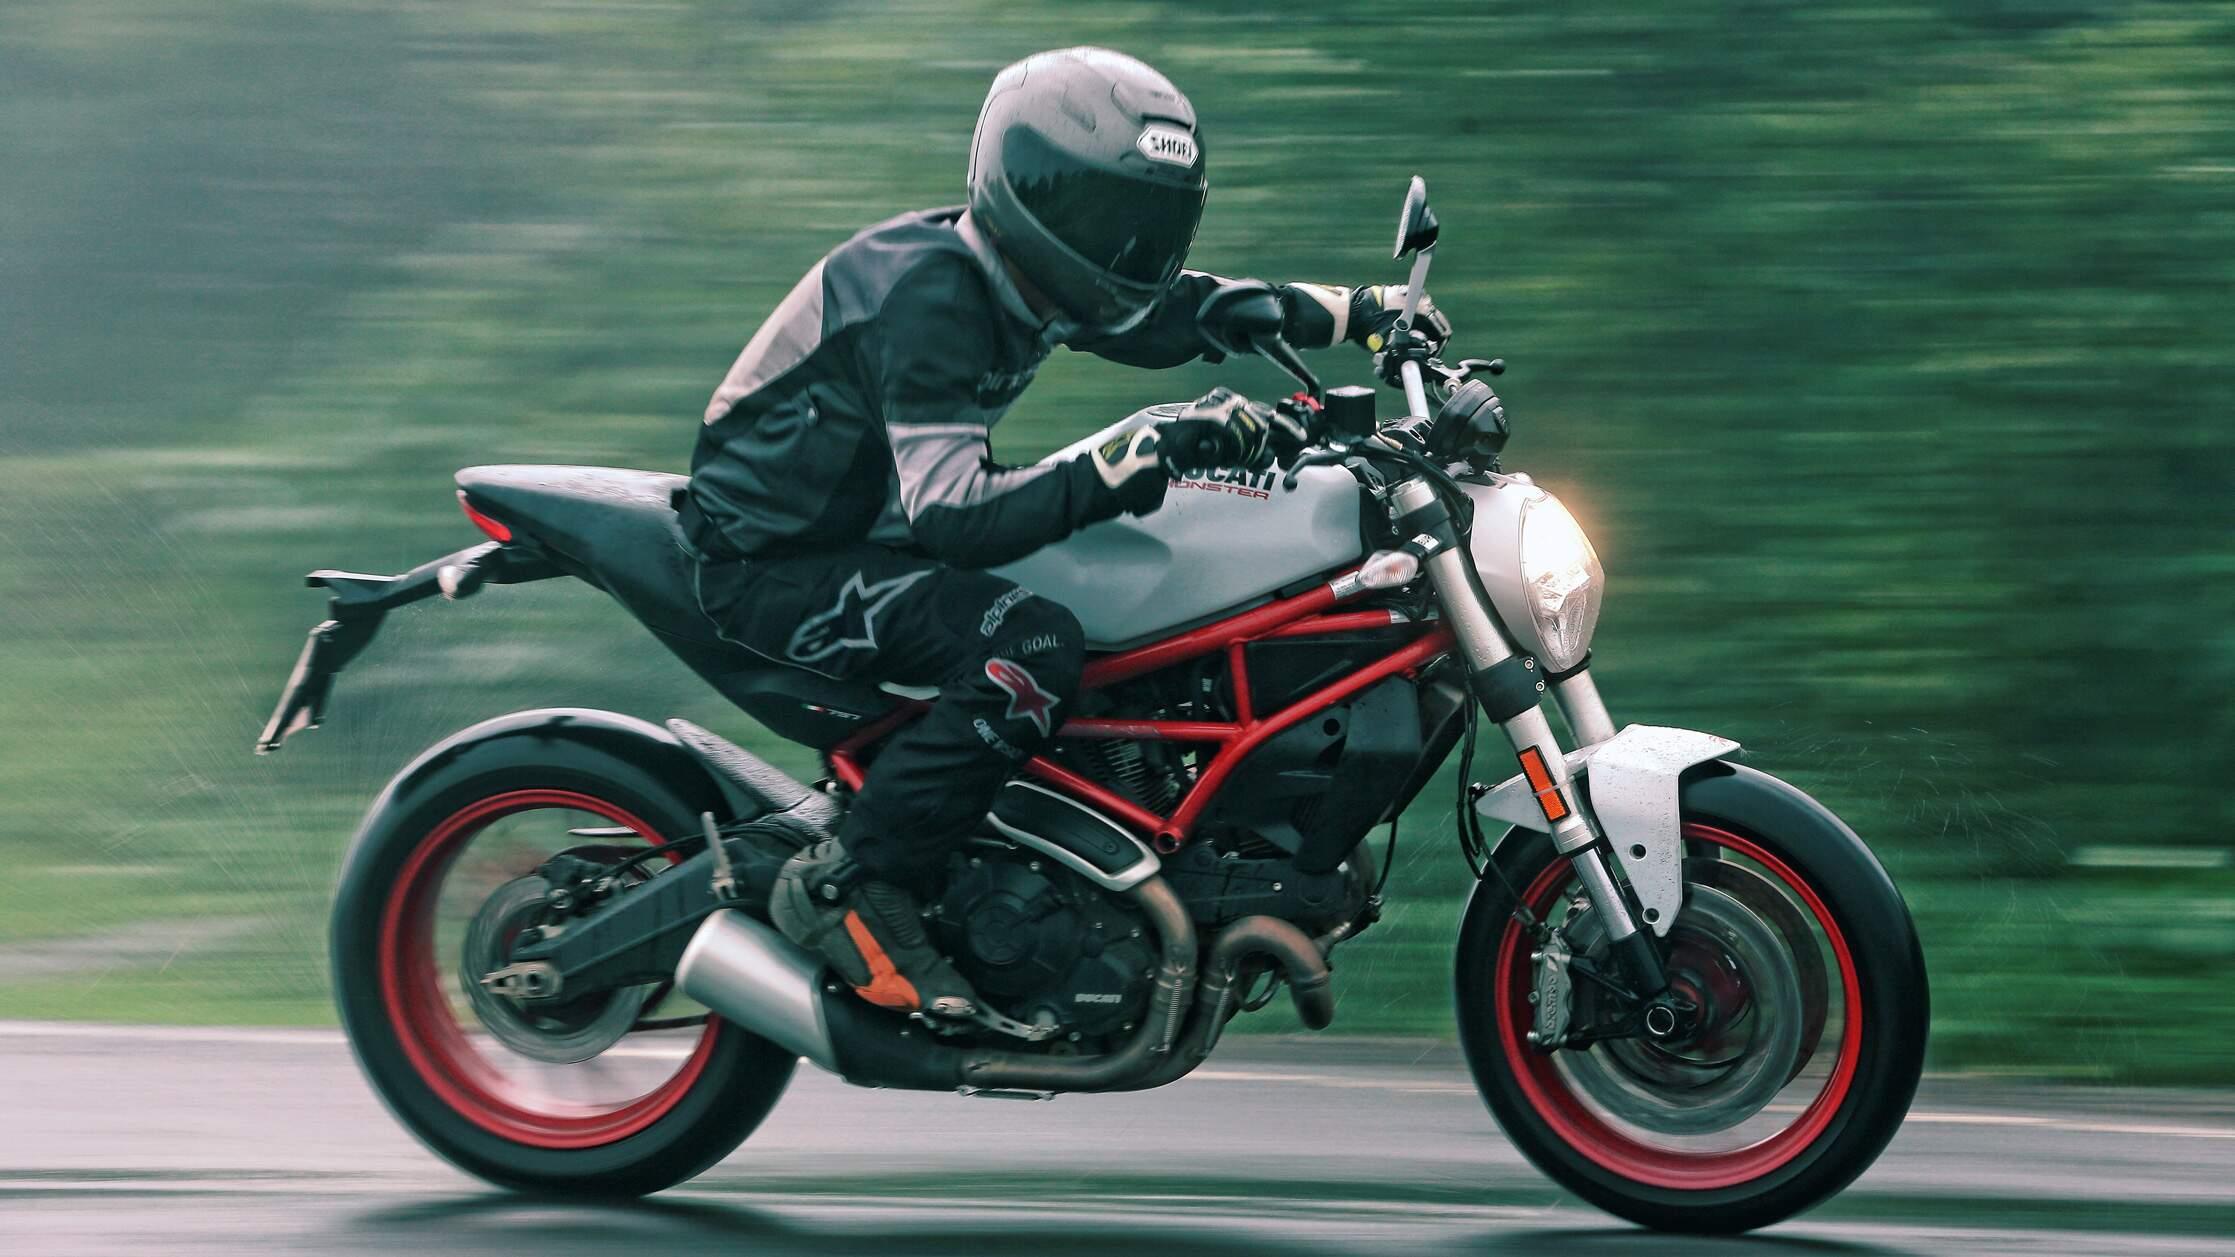 Ficha técnica Ducati Monster